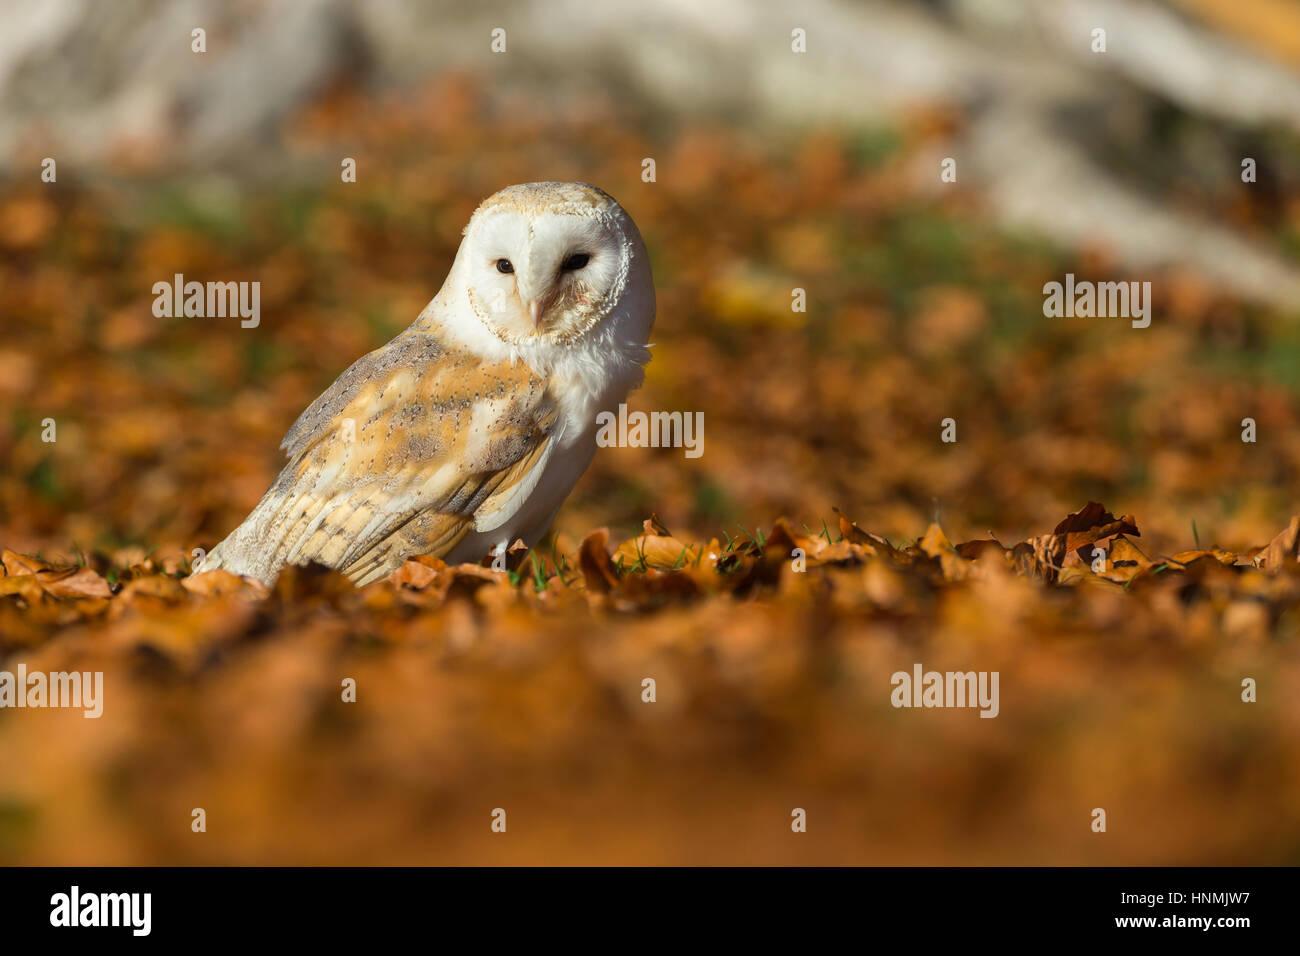 Barn owl Tyto alba (captive), adult female, resting amongst beech leaves, Hawk Conservancy Trust, Hampshire, UK - Stock Image